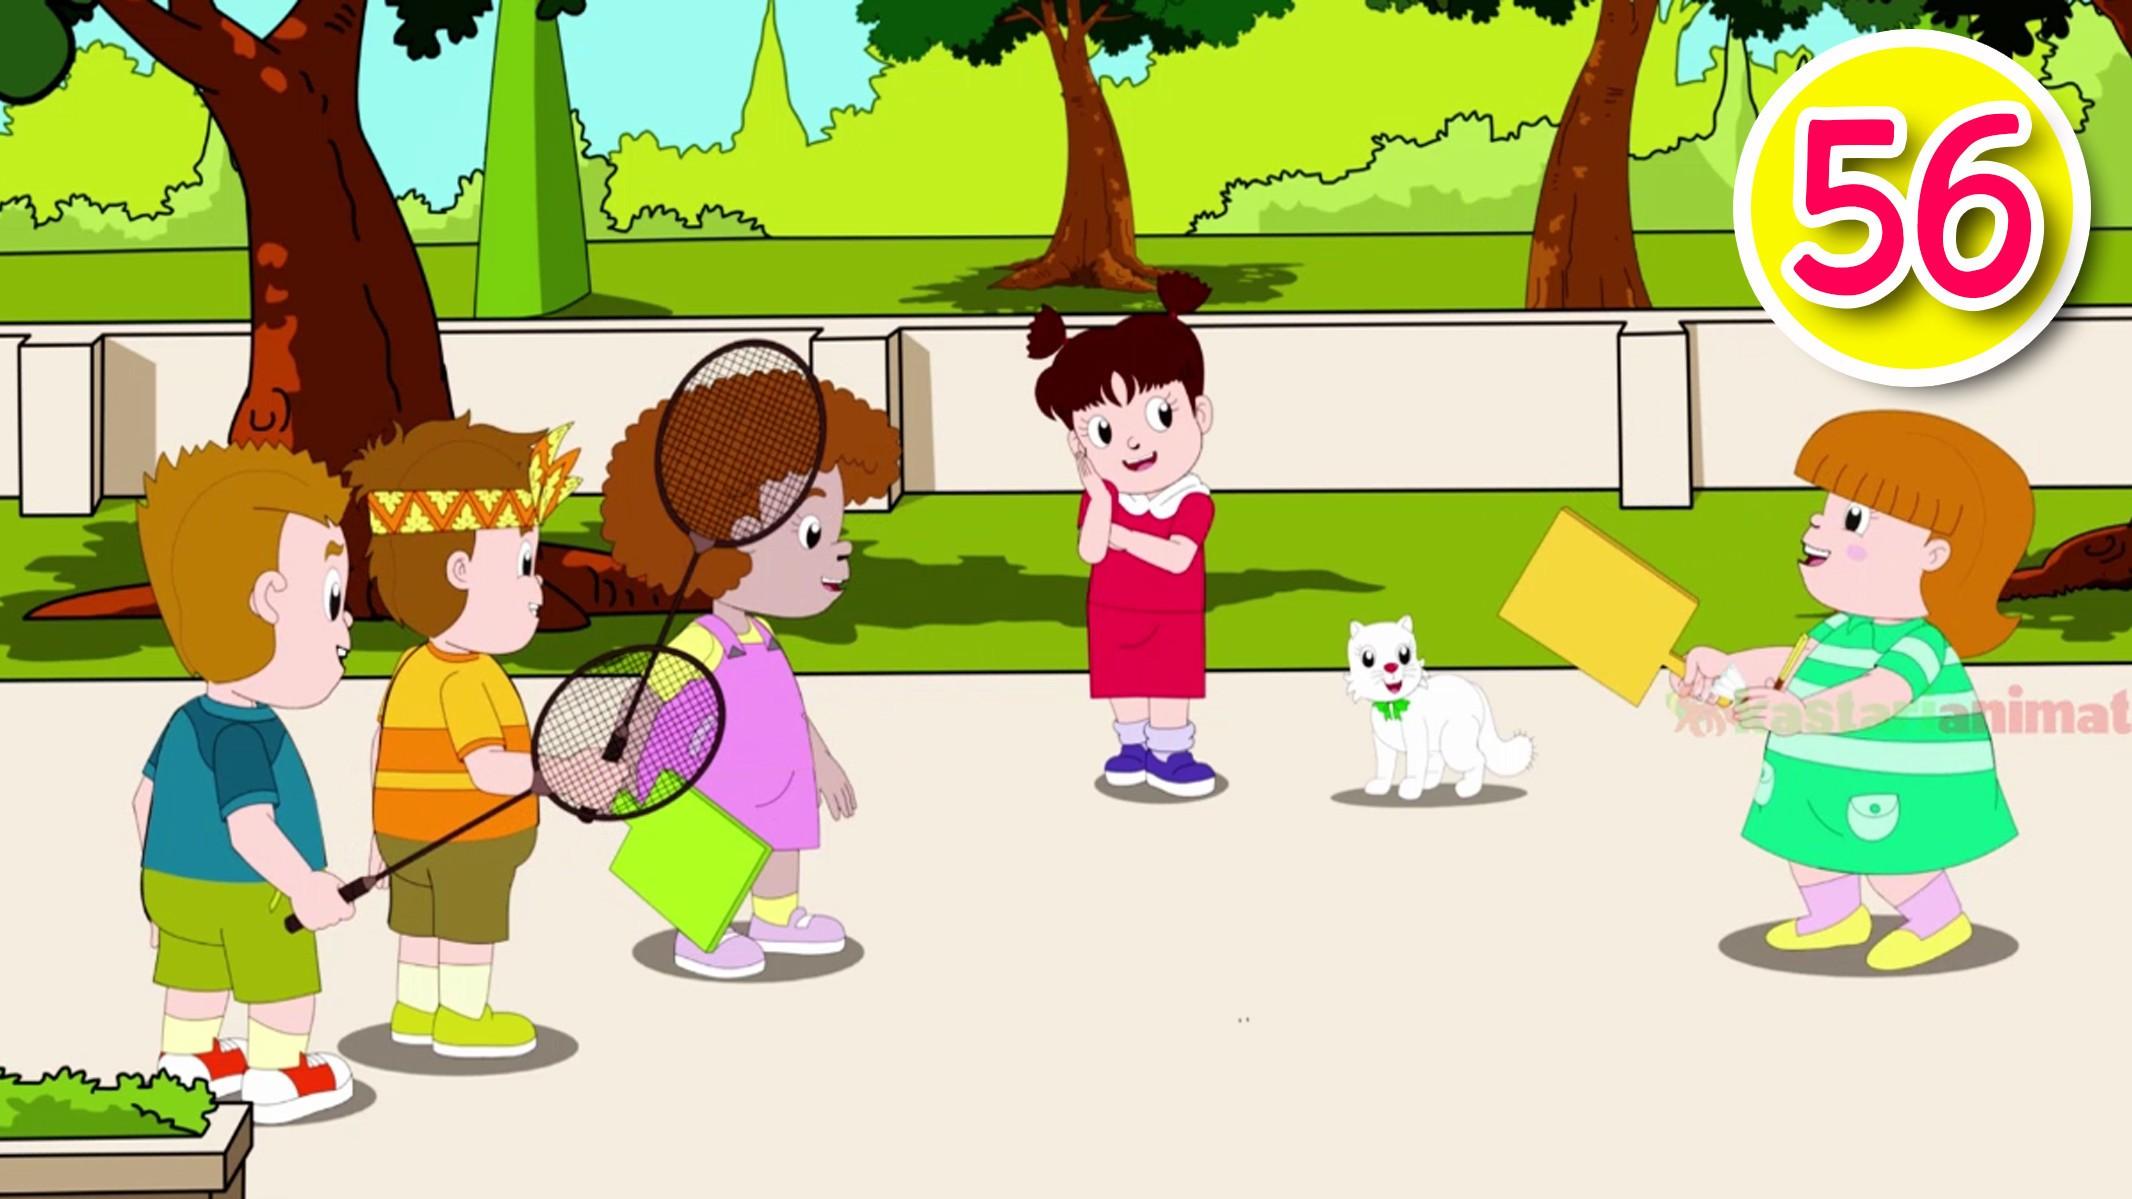 Menakjubkan 15+ Gambar Kartun Anak Menyapu - Gani Gambar